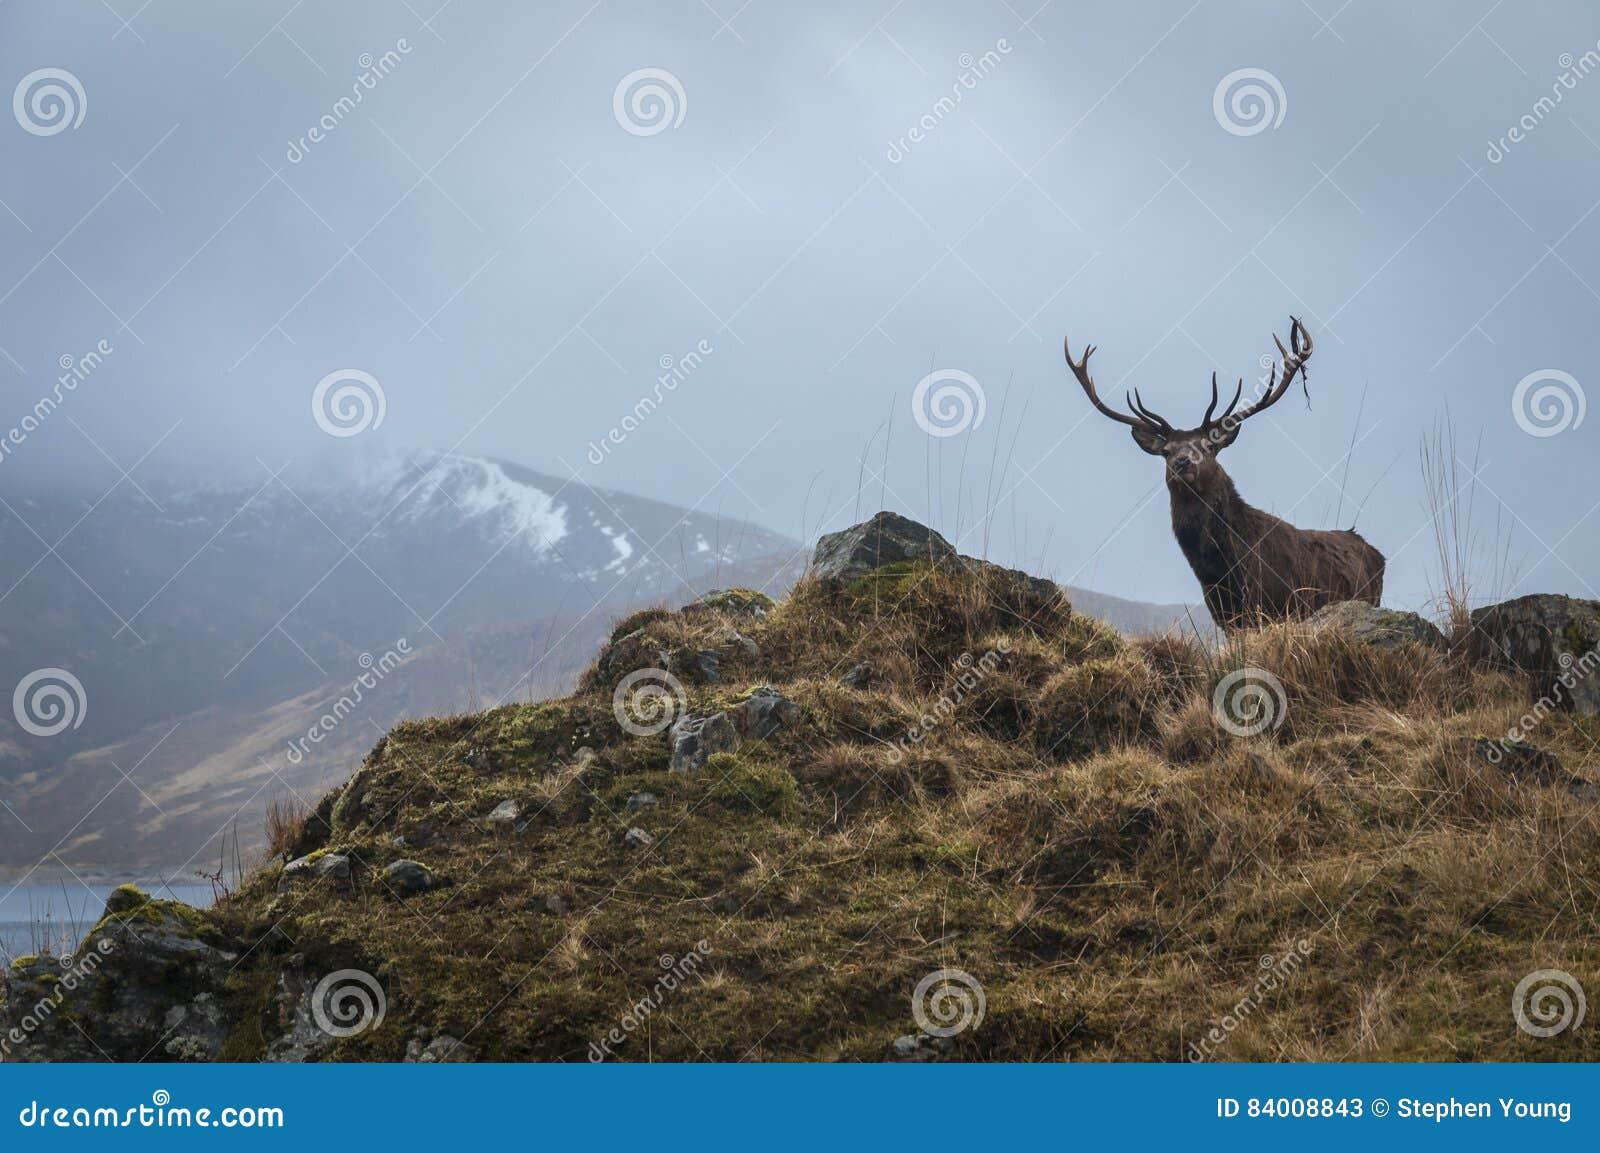 Red Deer Stag and antler dressing, Lochaber, Scotland